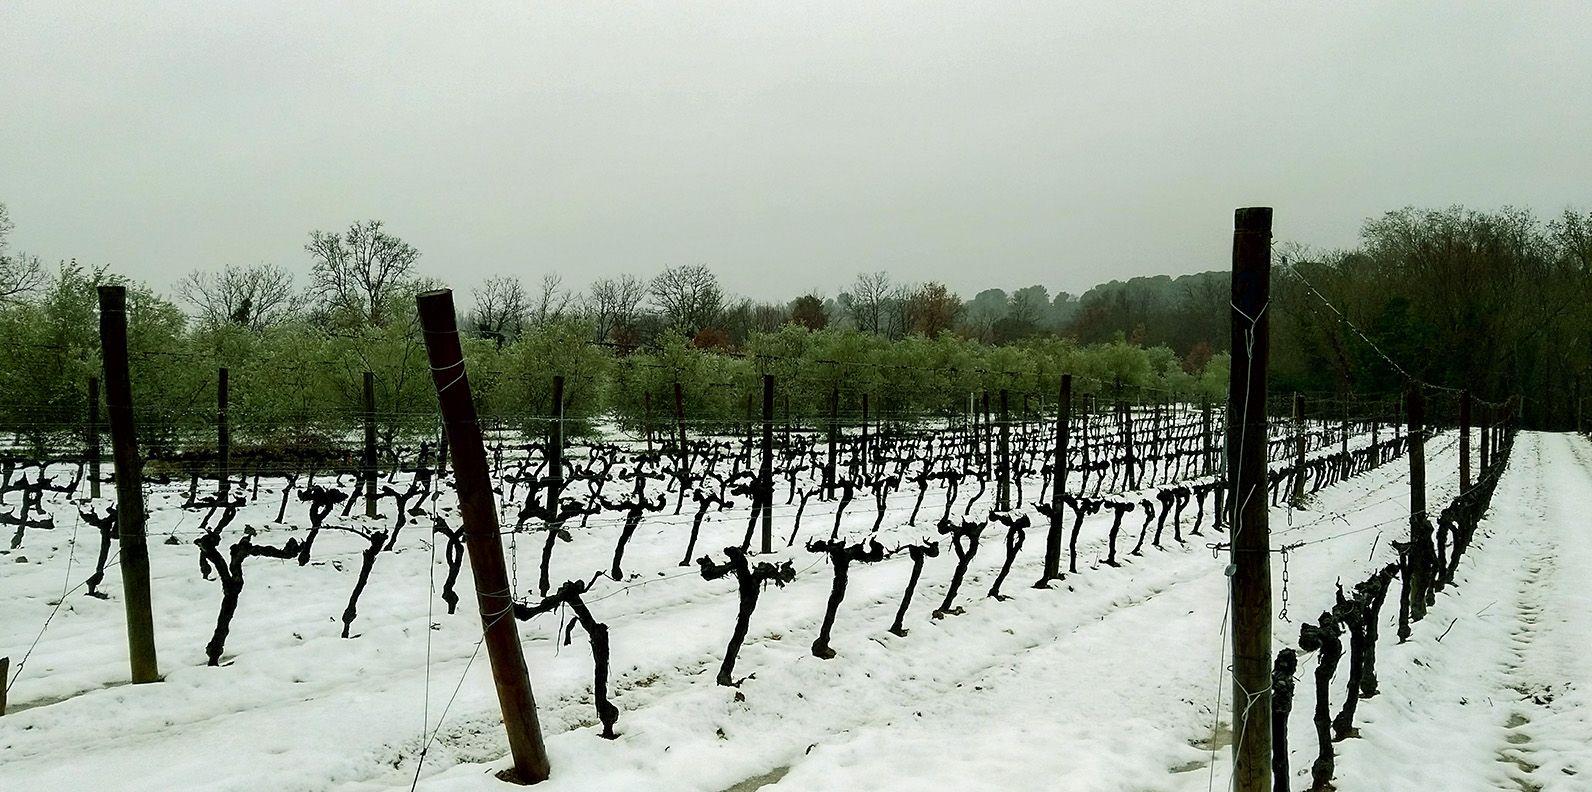 bassac snowy vineyard